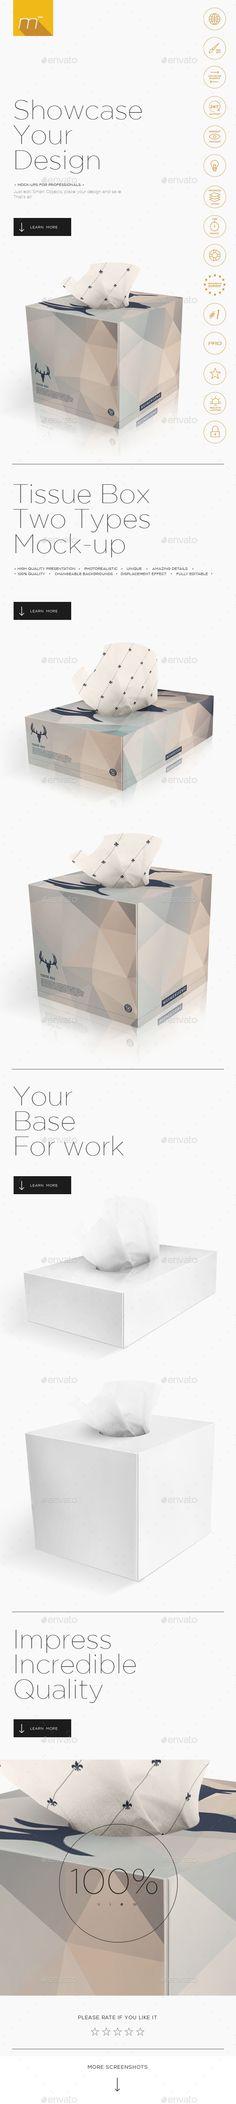 2x Tissue Box Mock-up #design Download: http://graphicriver.net/item/2x-tissue-box-mockup/14011734?ref=ksioks